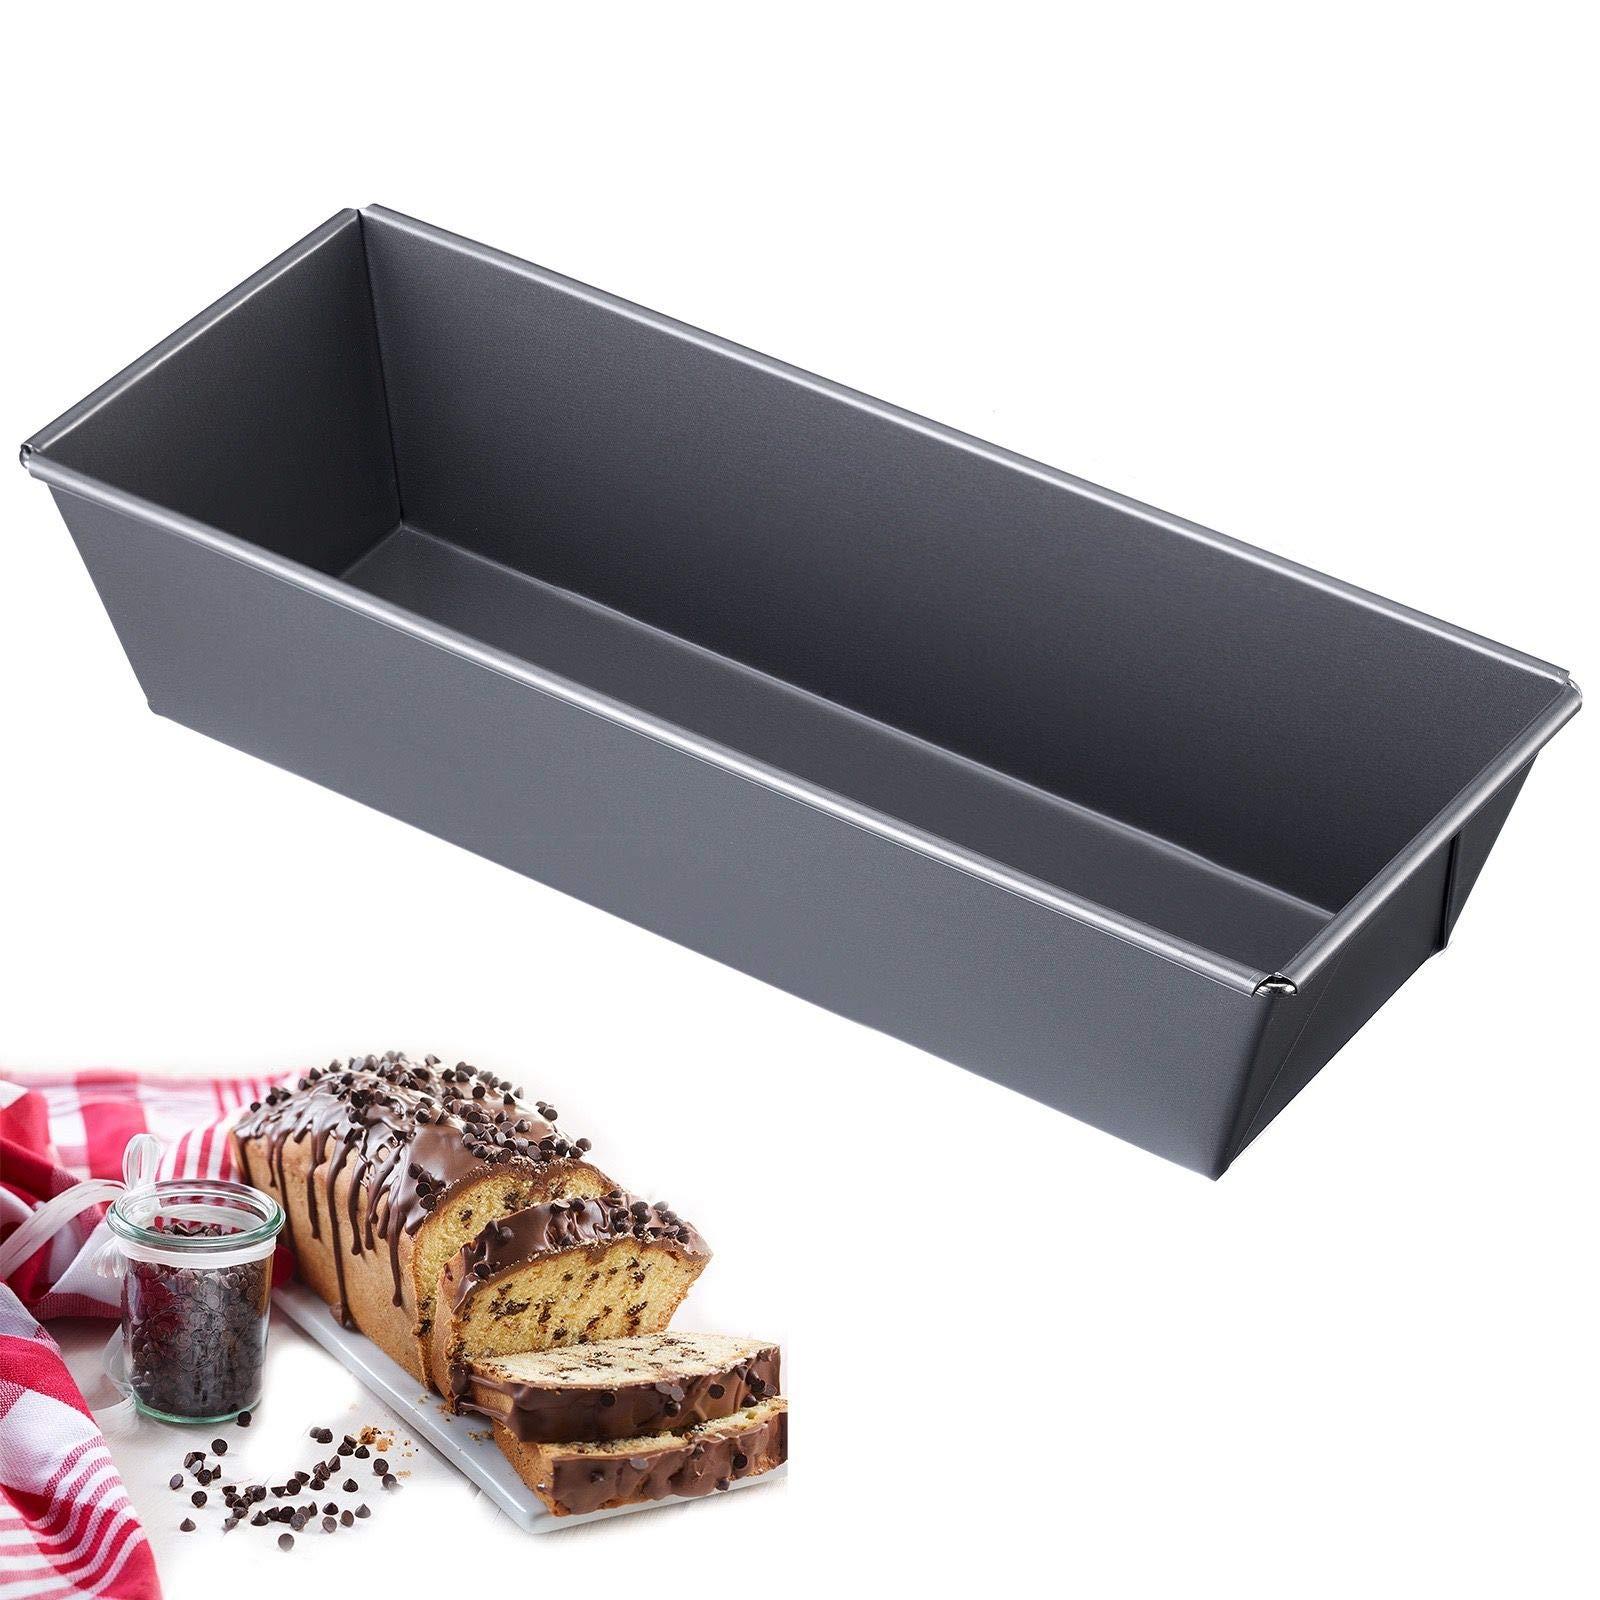 Westmark 32862270 12'' Nonstick Loaf Pan, 11.8'' x 4.75'', Gray